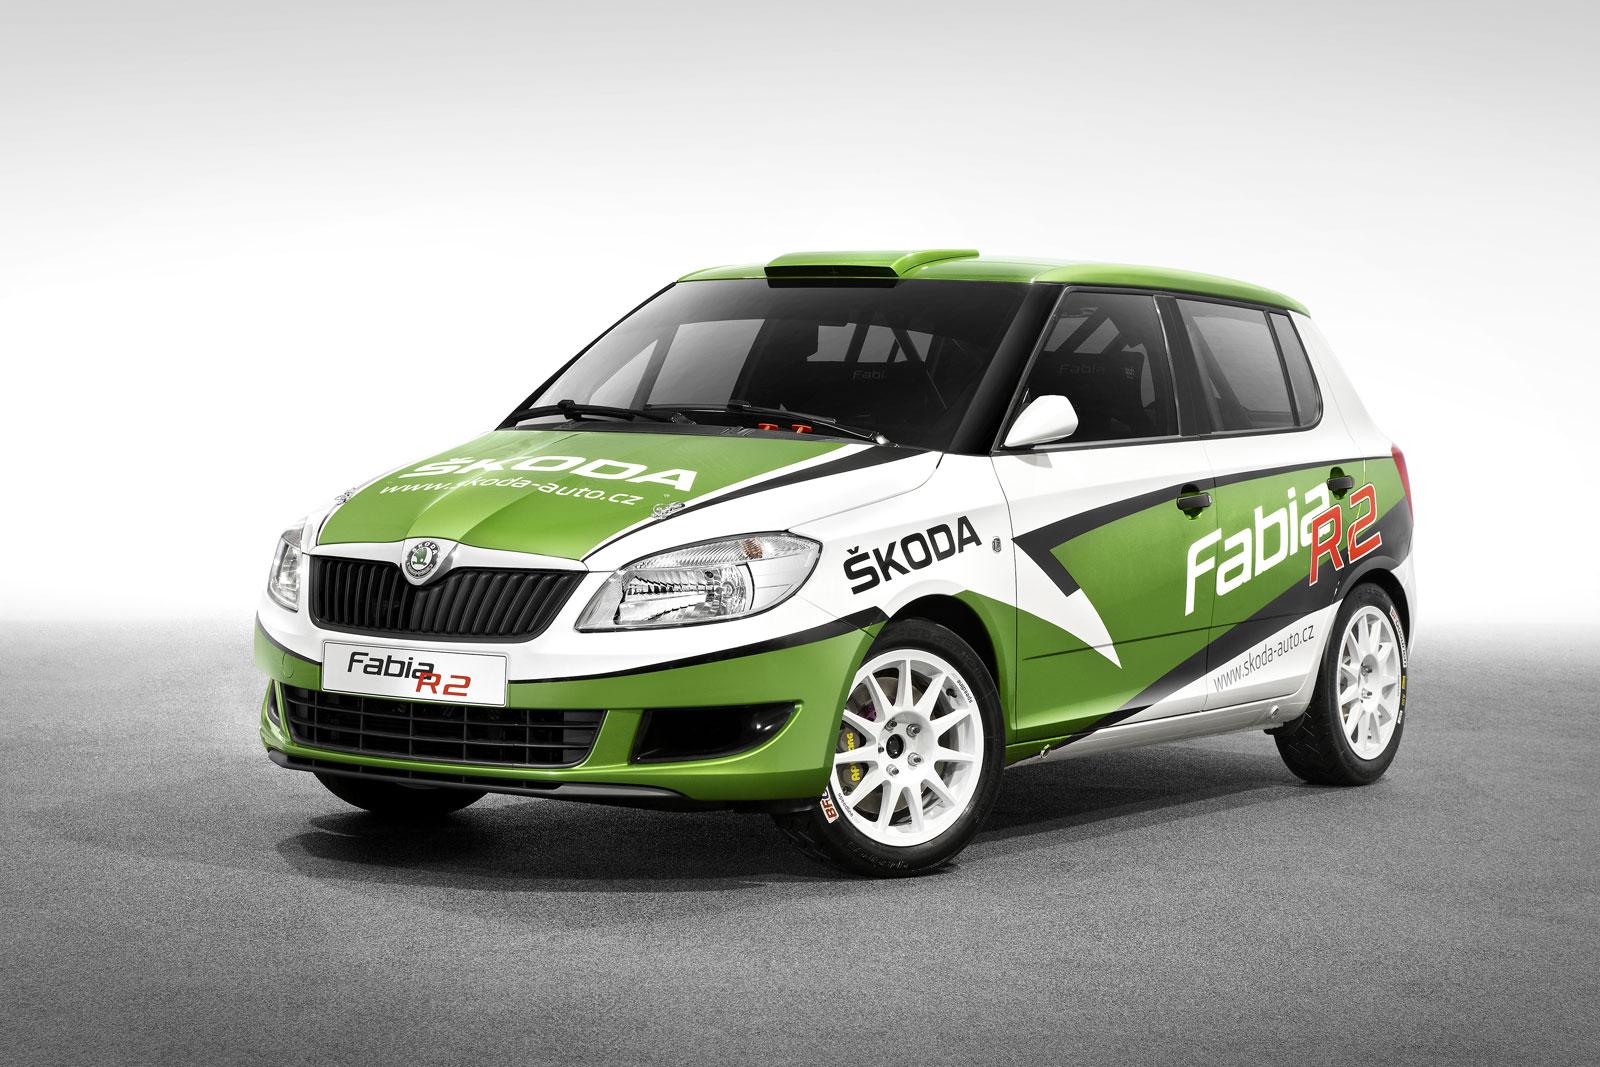 skoda fabia r2 rally car. Black Bedroom Furniture Sets. Home Design Ideas